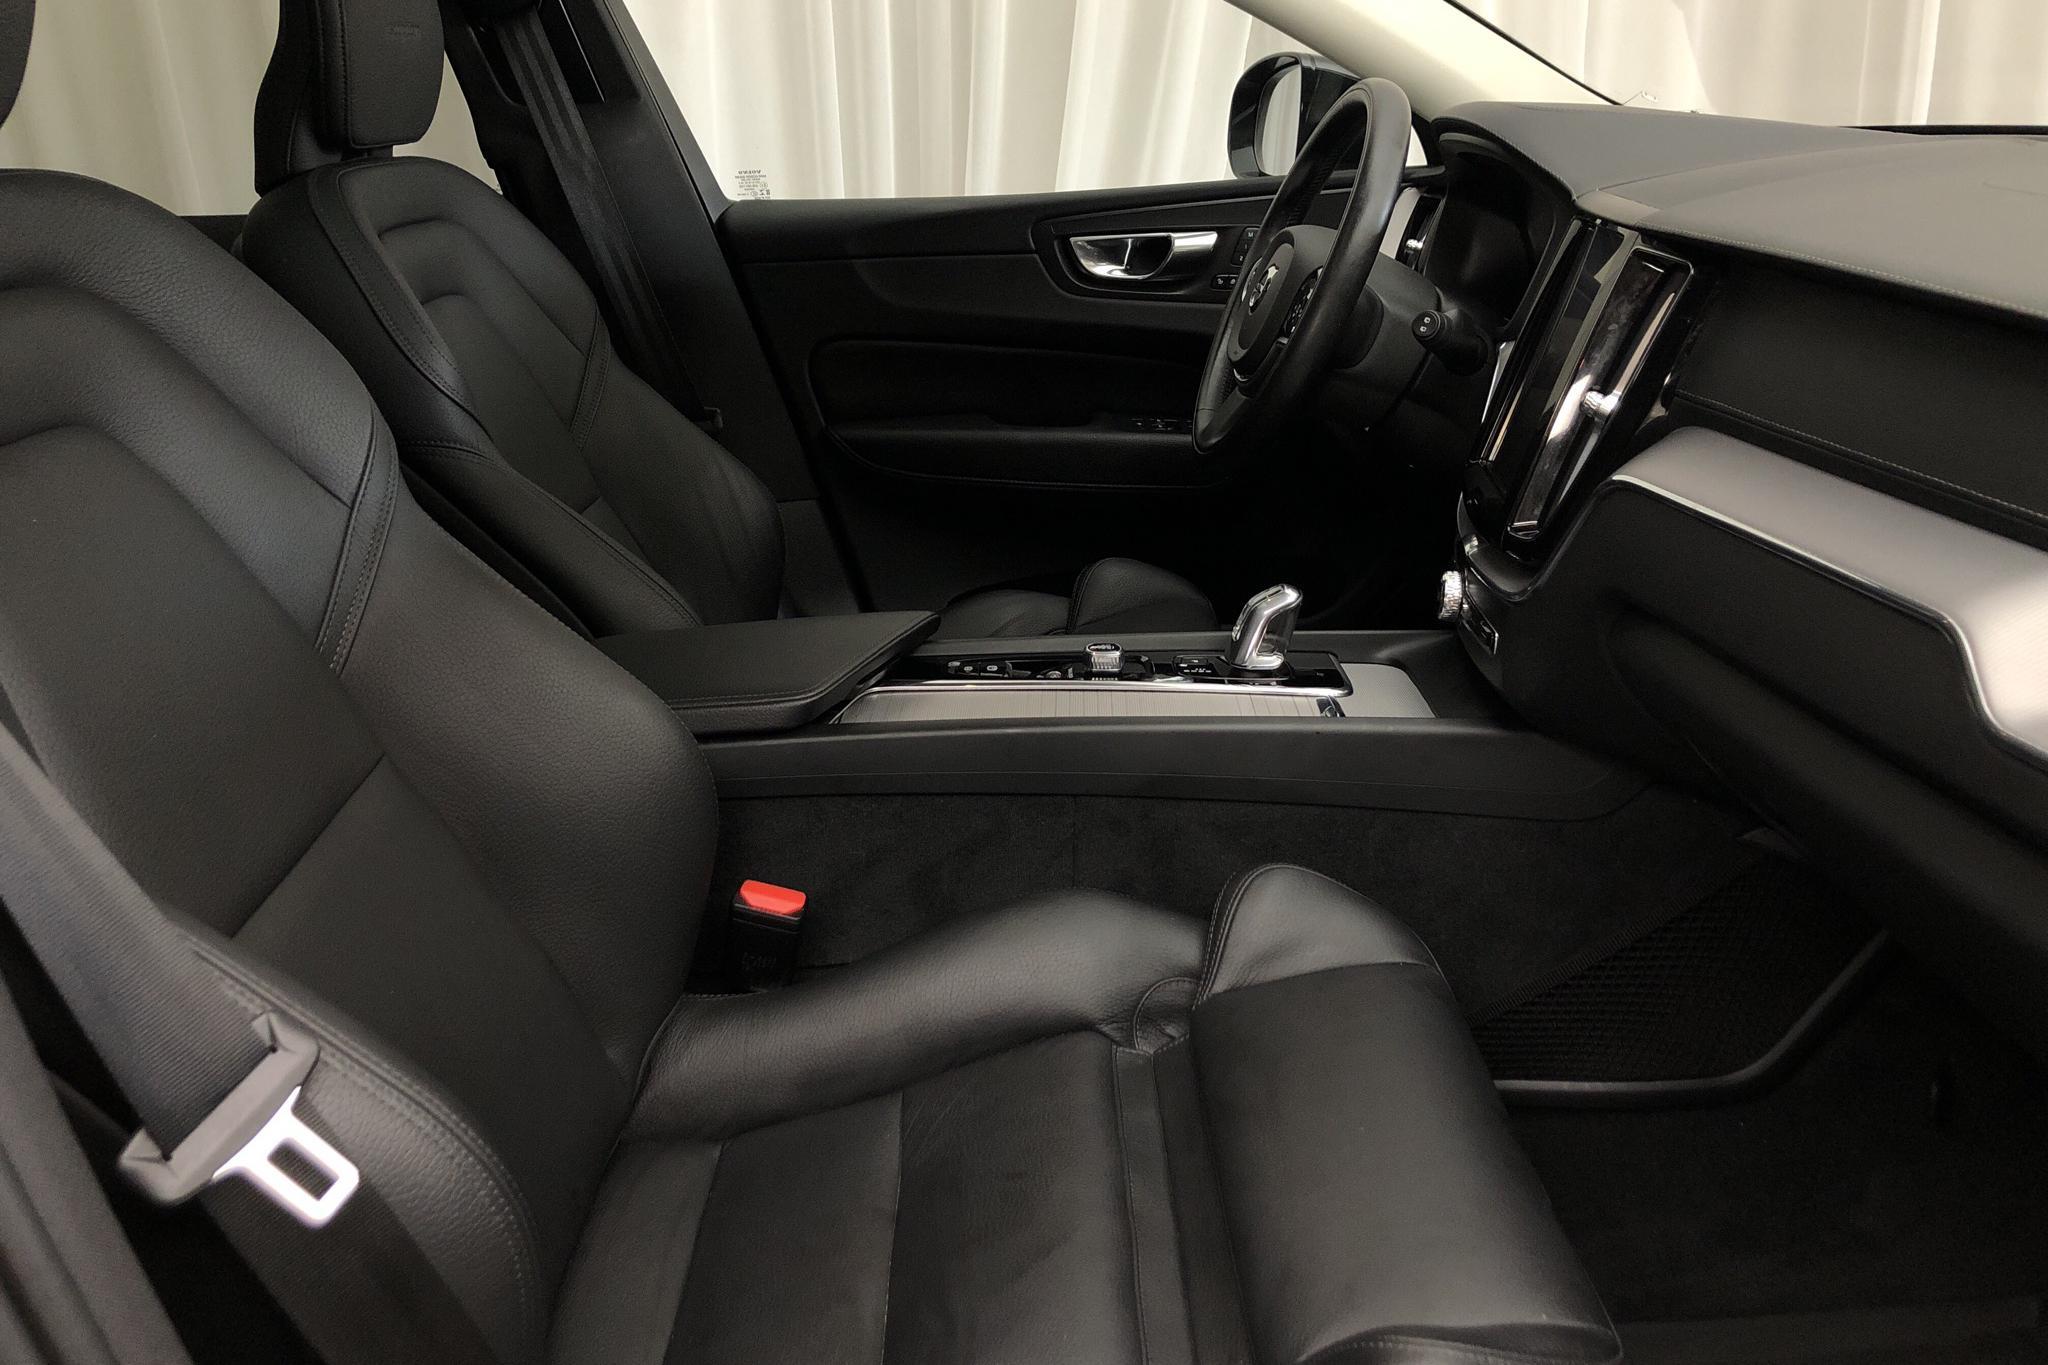 Volvo XC60 T8 AWD Twin Engine (390hk) - 62 380 km - Automatic - black - 2019